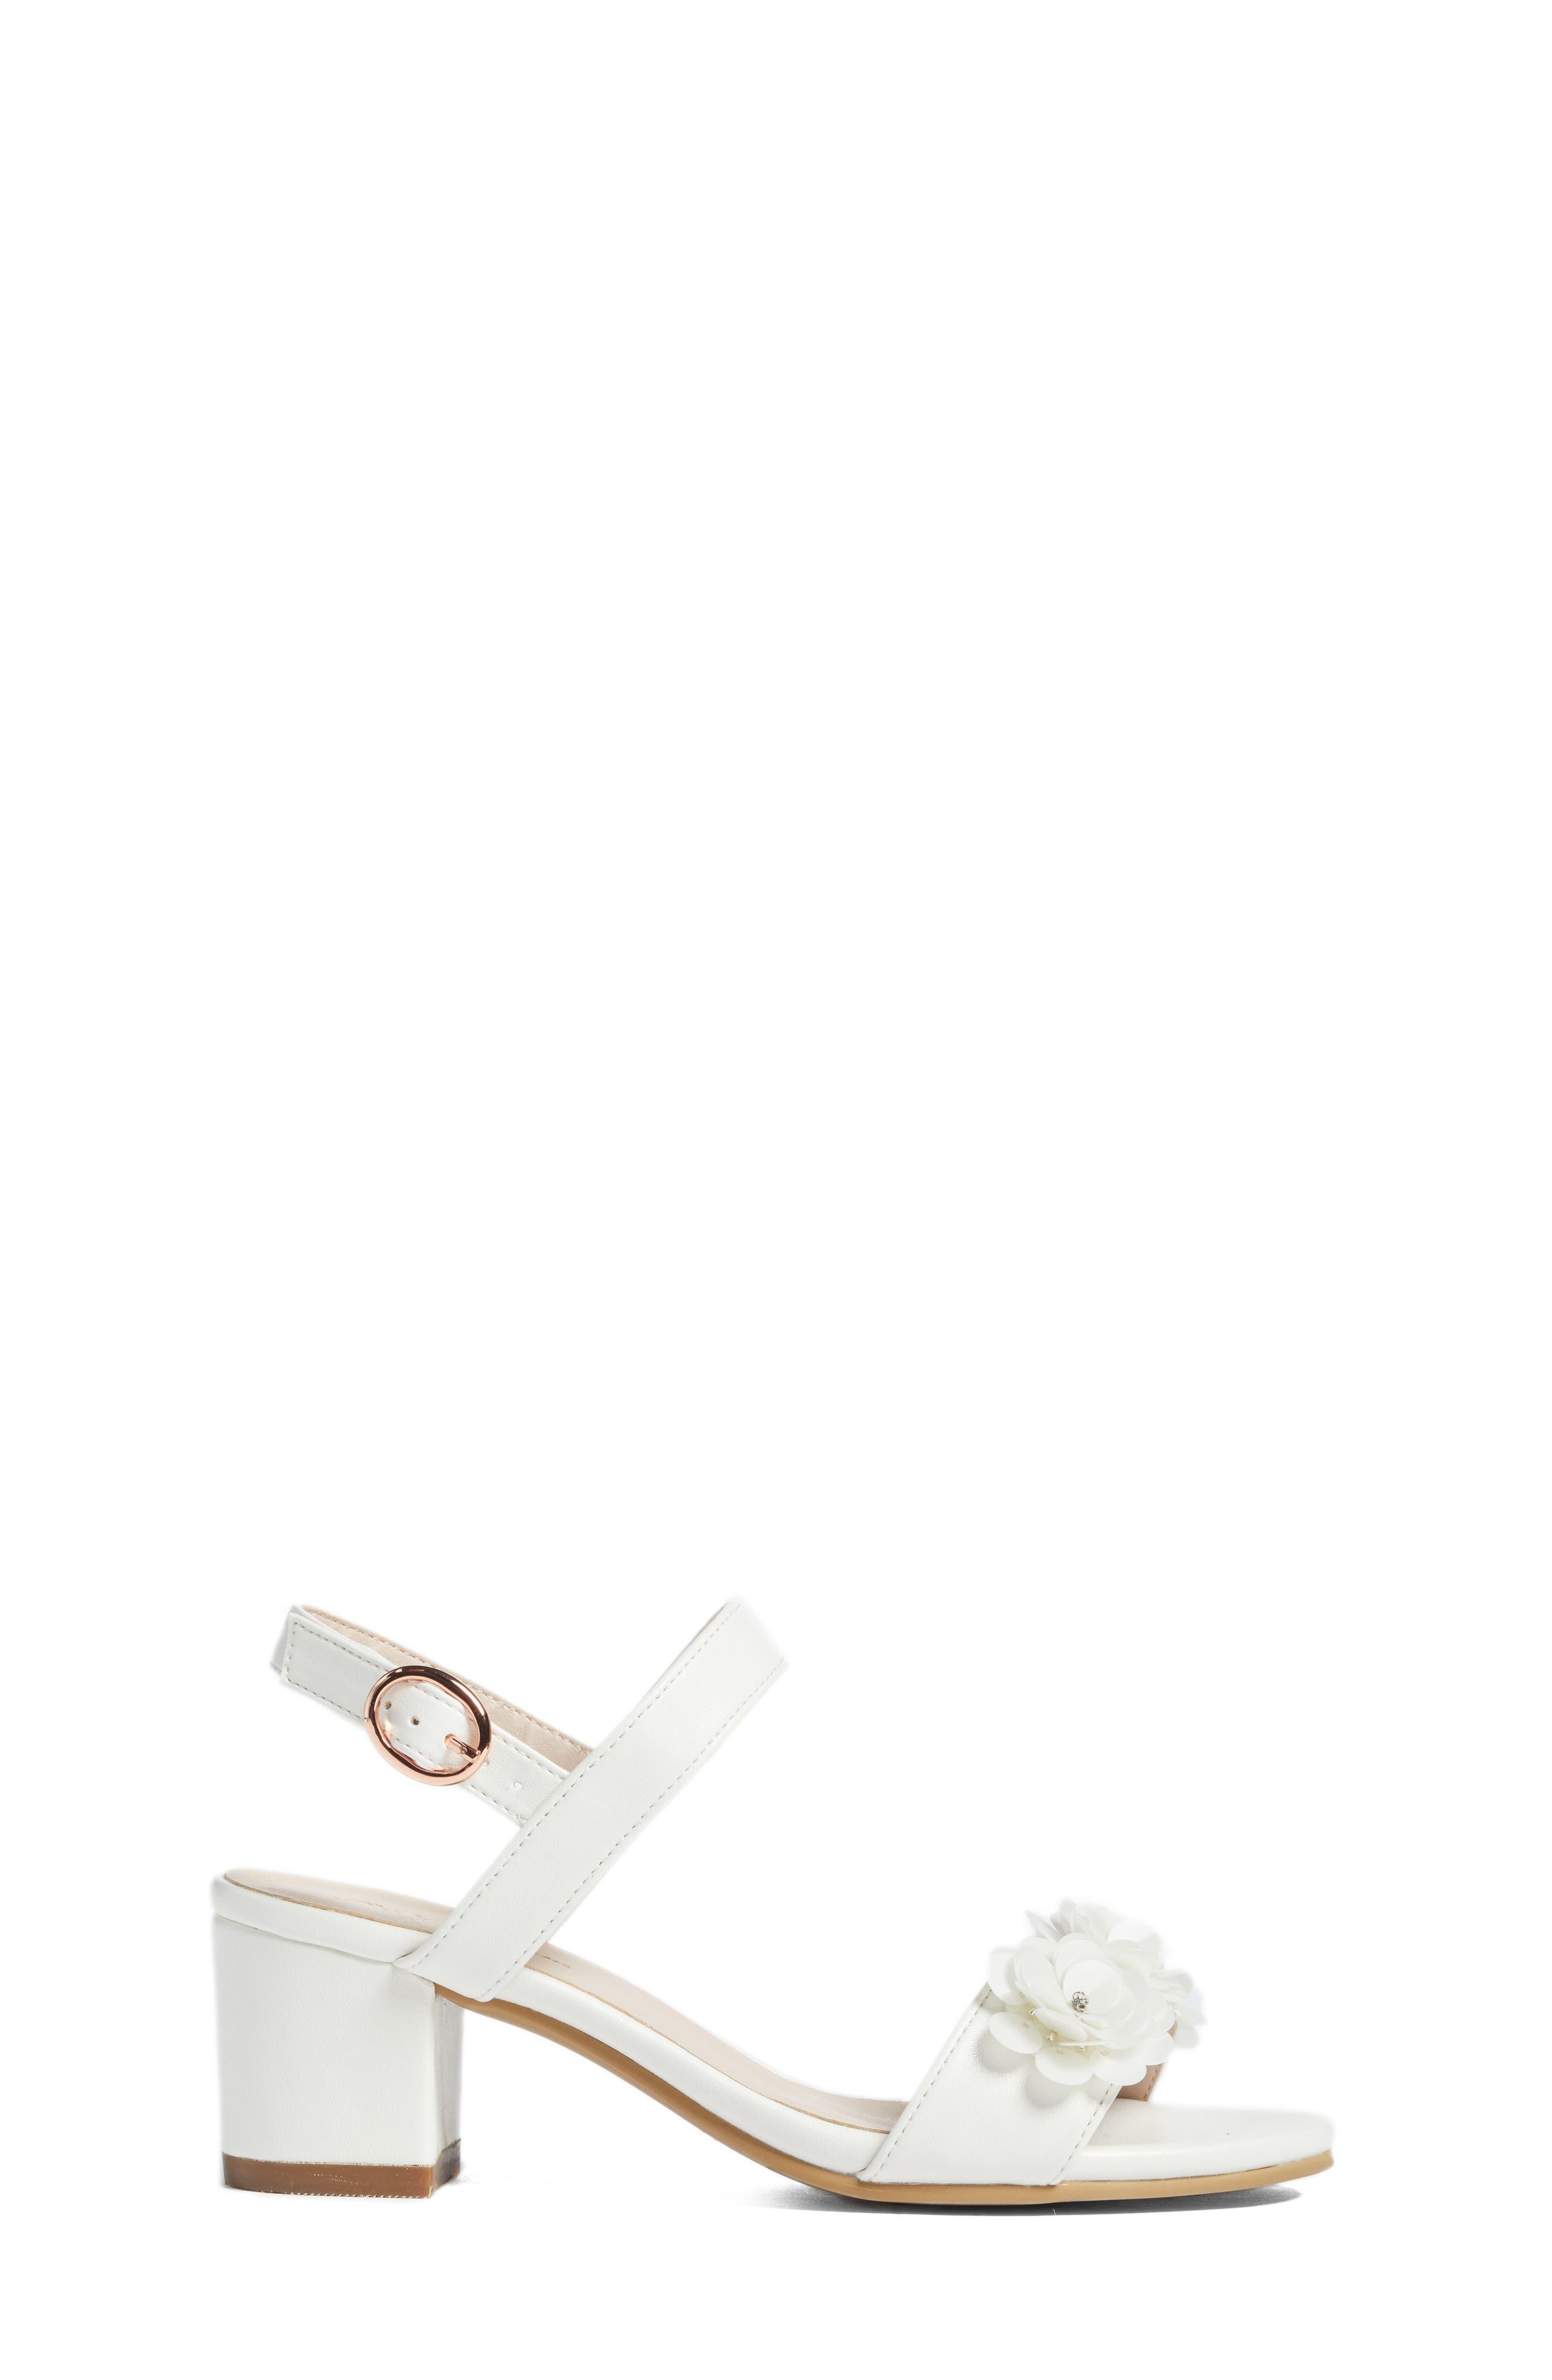 Dina Flowered Sandal,                             Alternate thumbnail 3, color,                             White Faux Leather